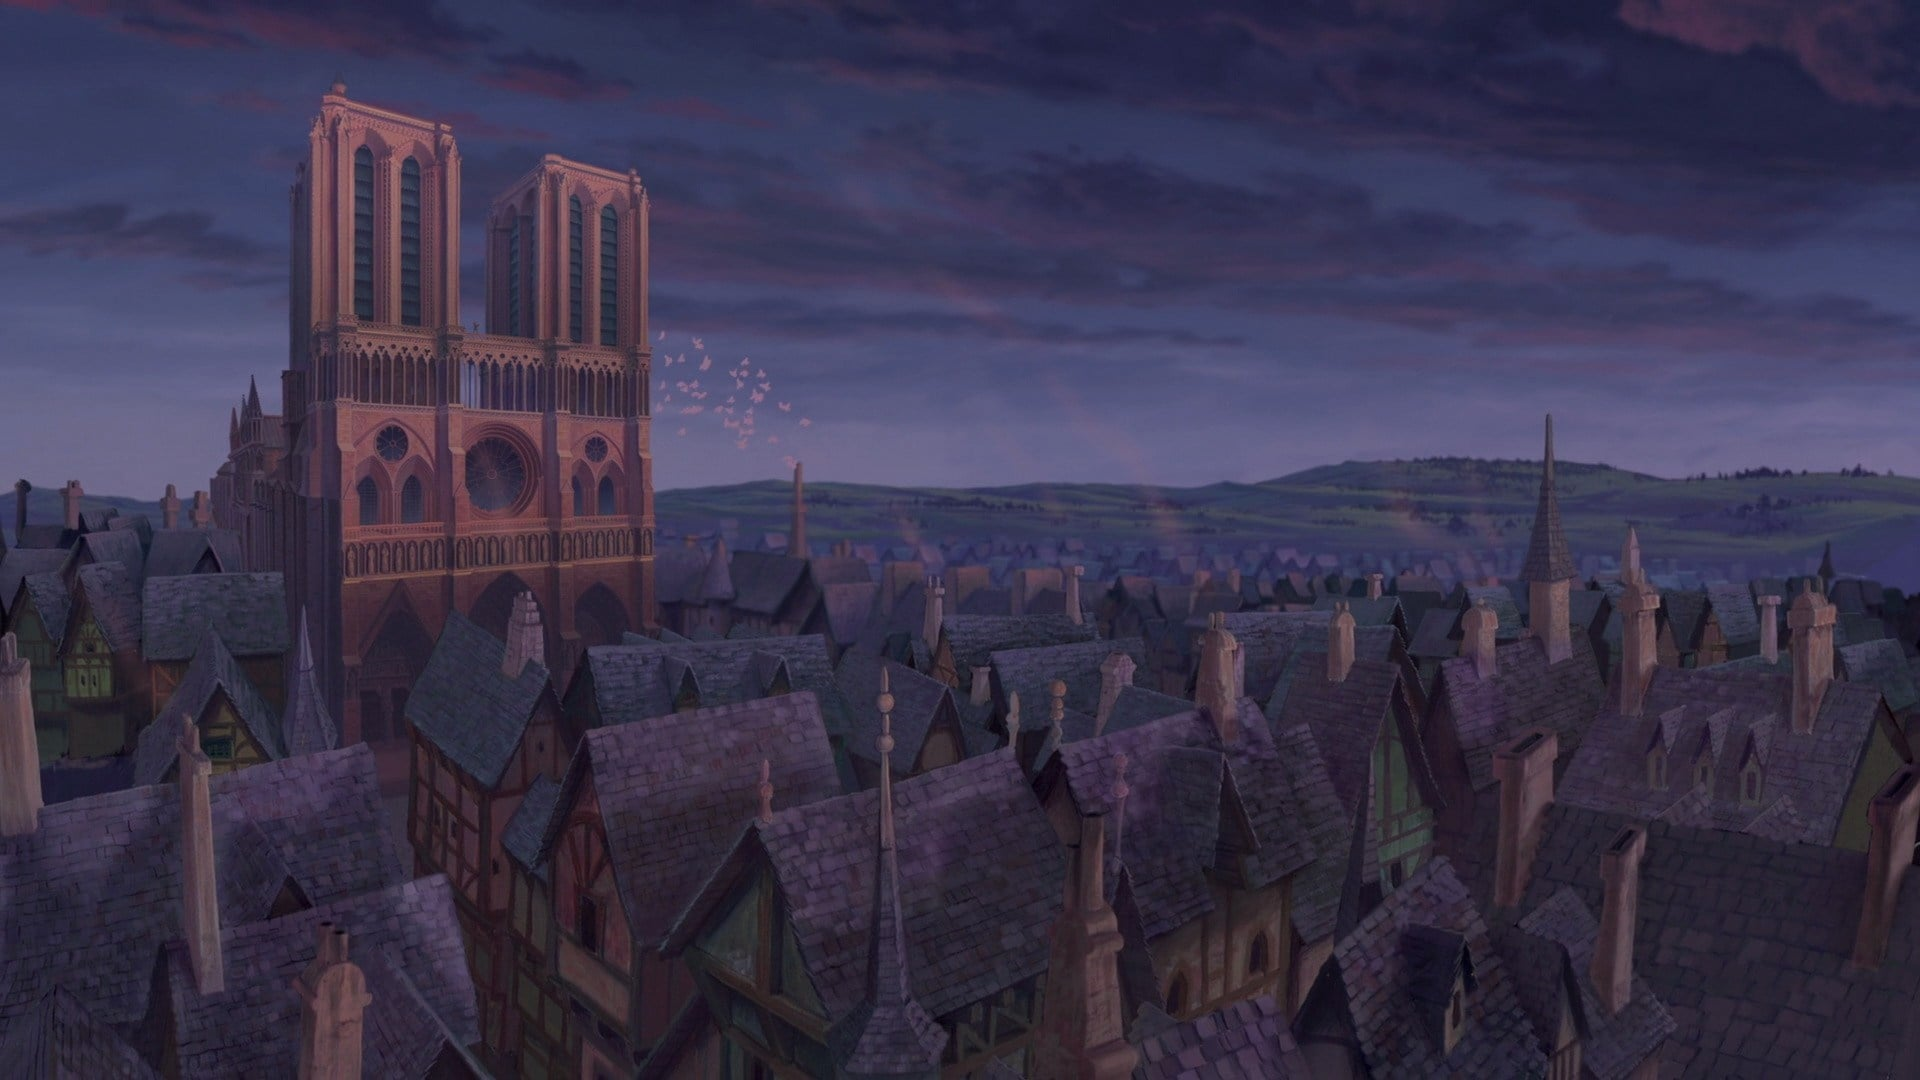 The Hunchback of Notre Dame backdrop